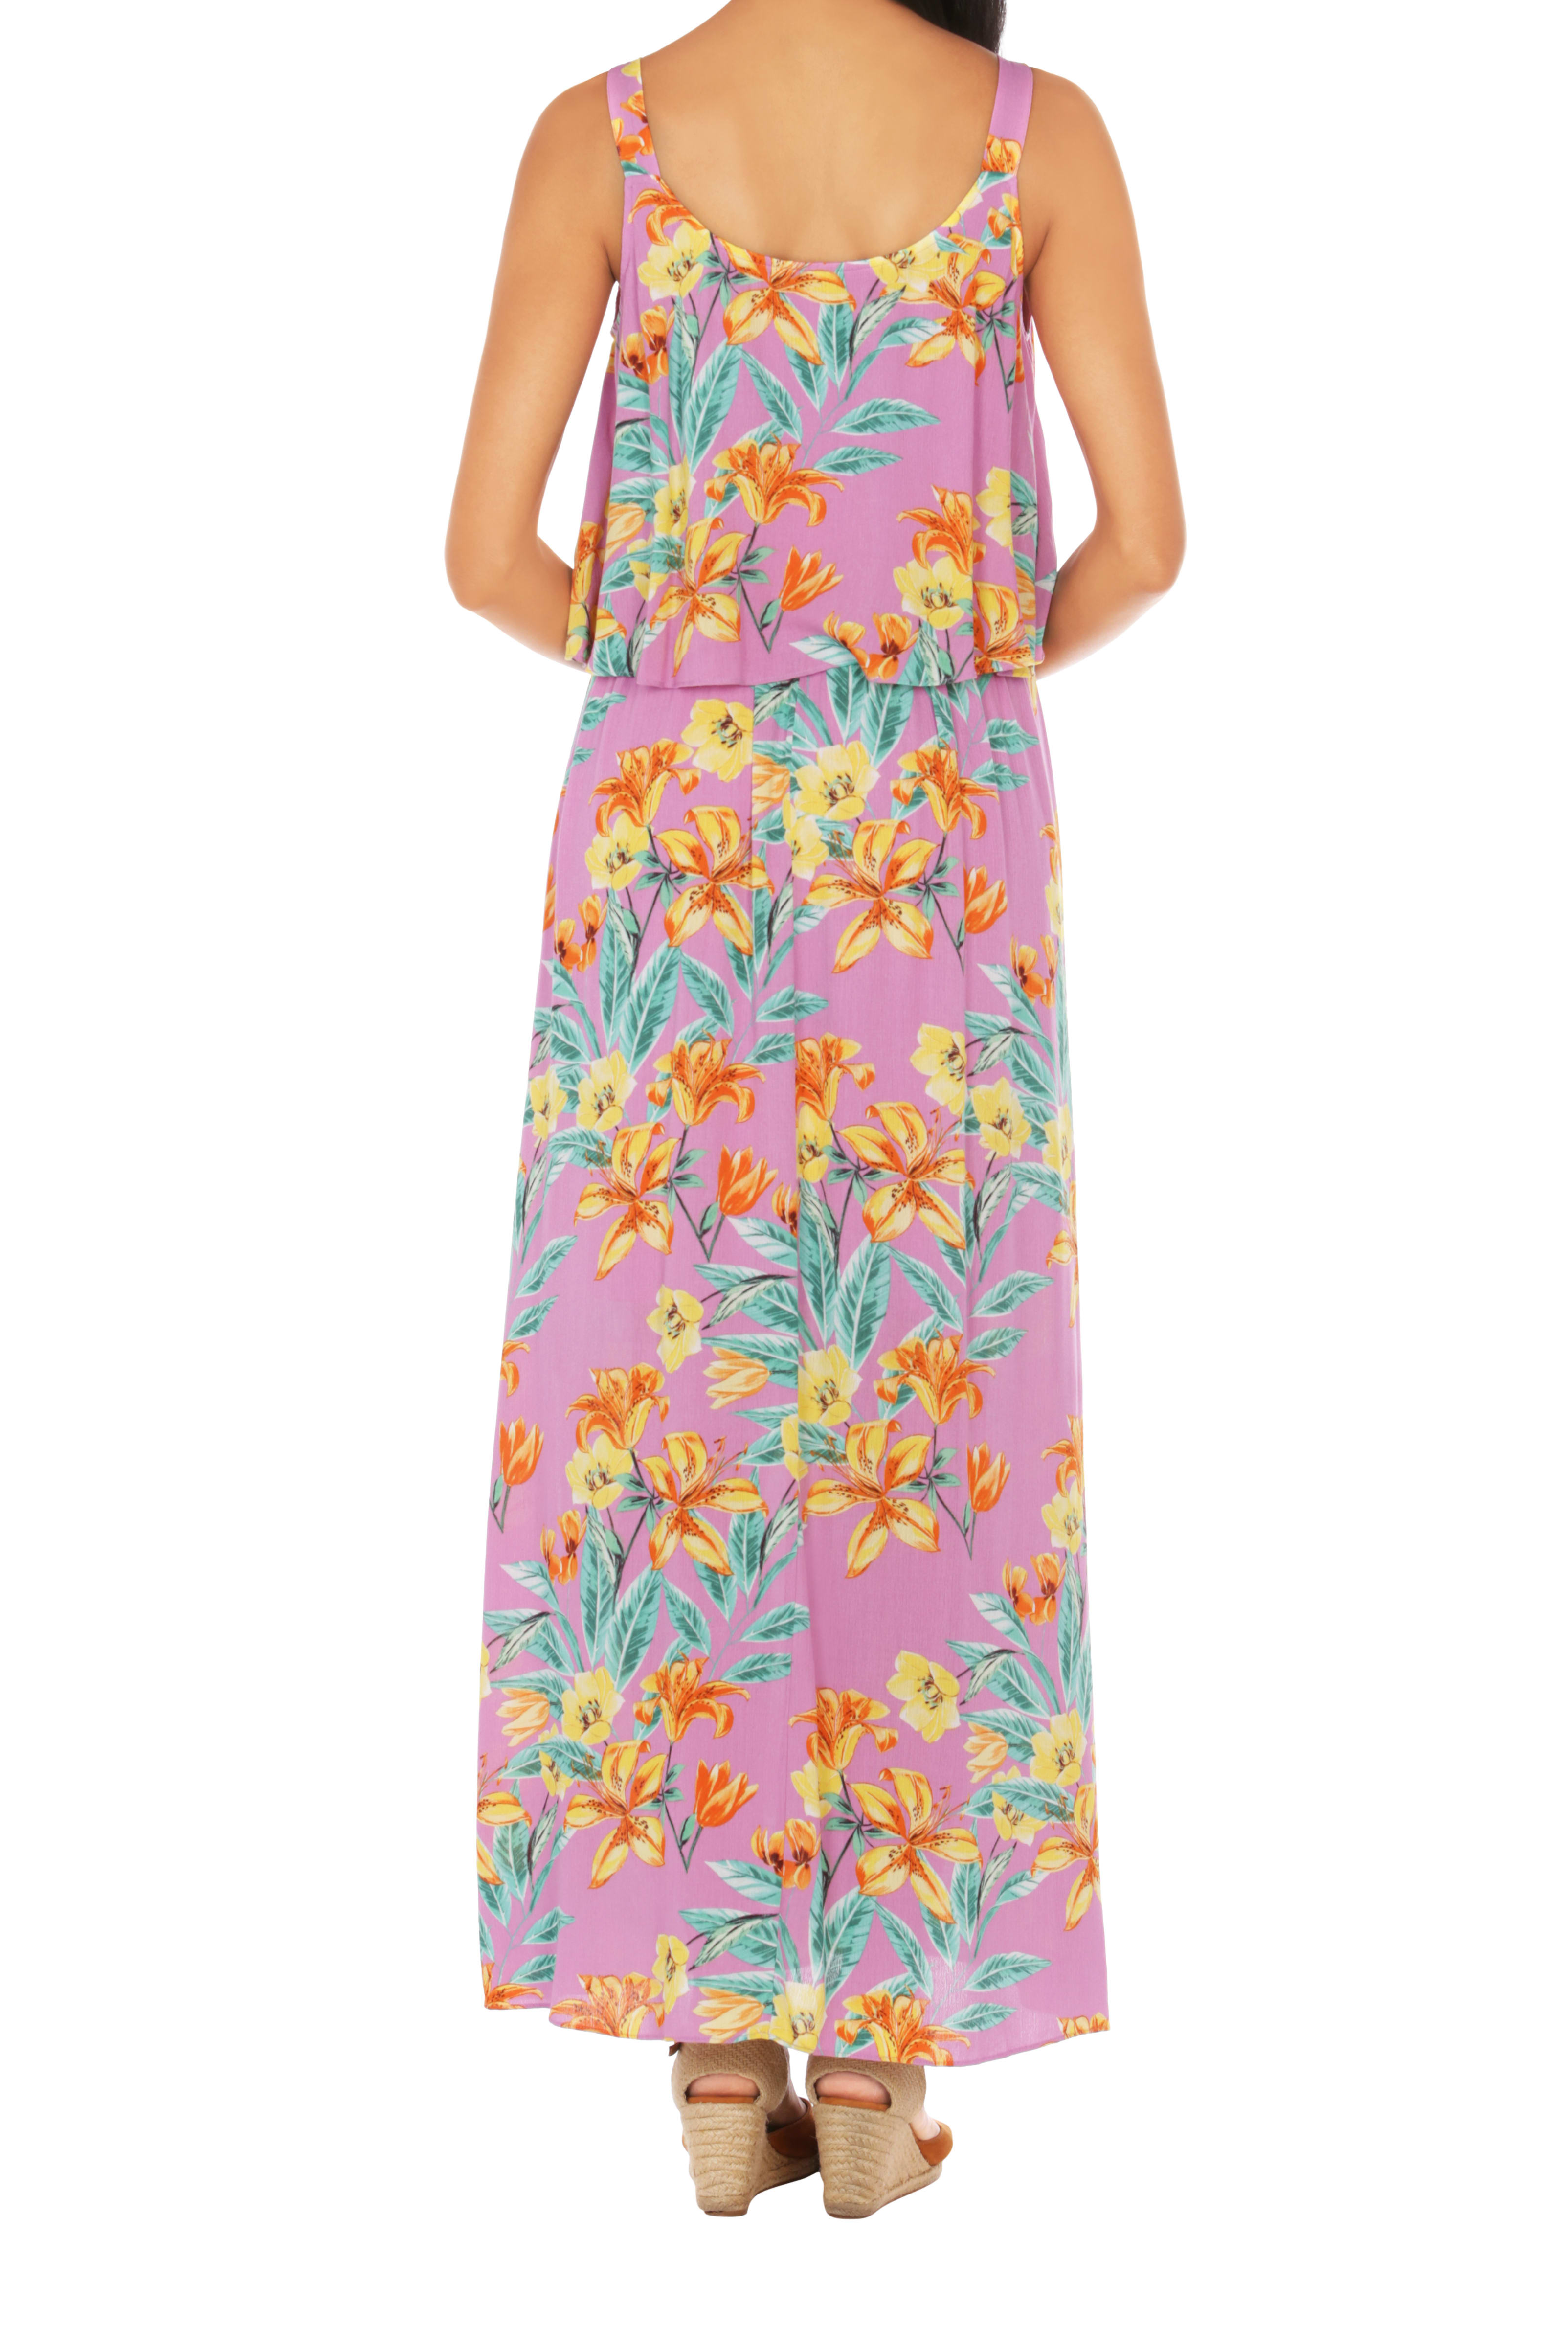 Caribbean Joe® Double Layer Maxi Dress - Pink - Back